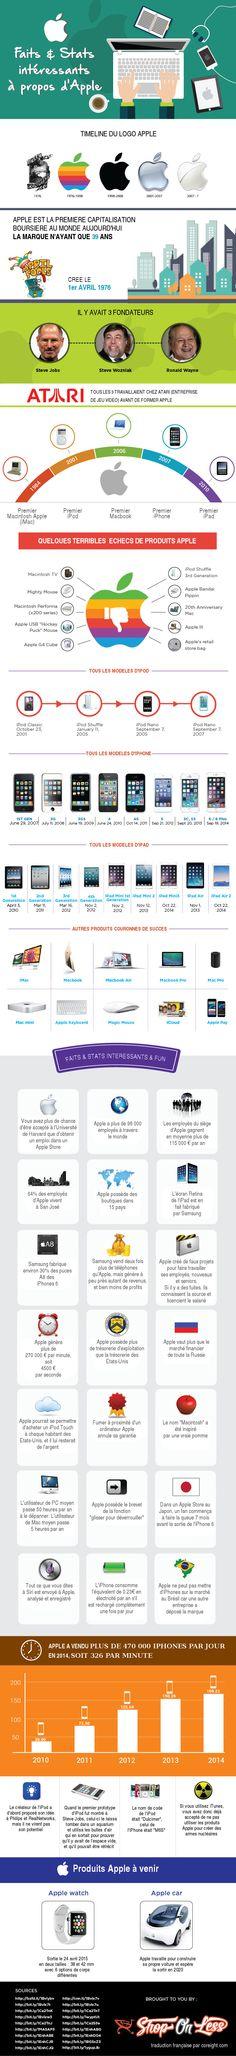 Apple Faits & Stats